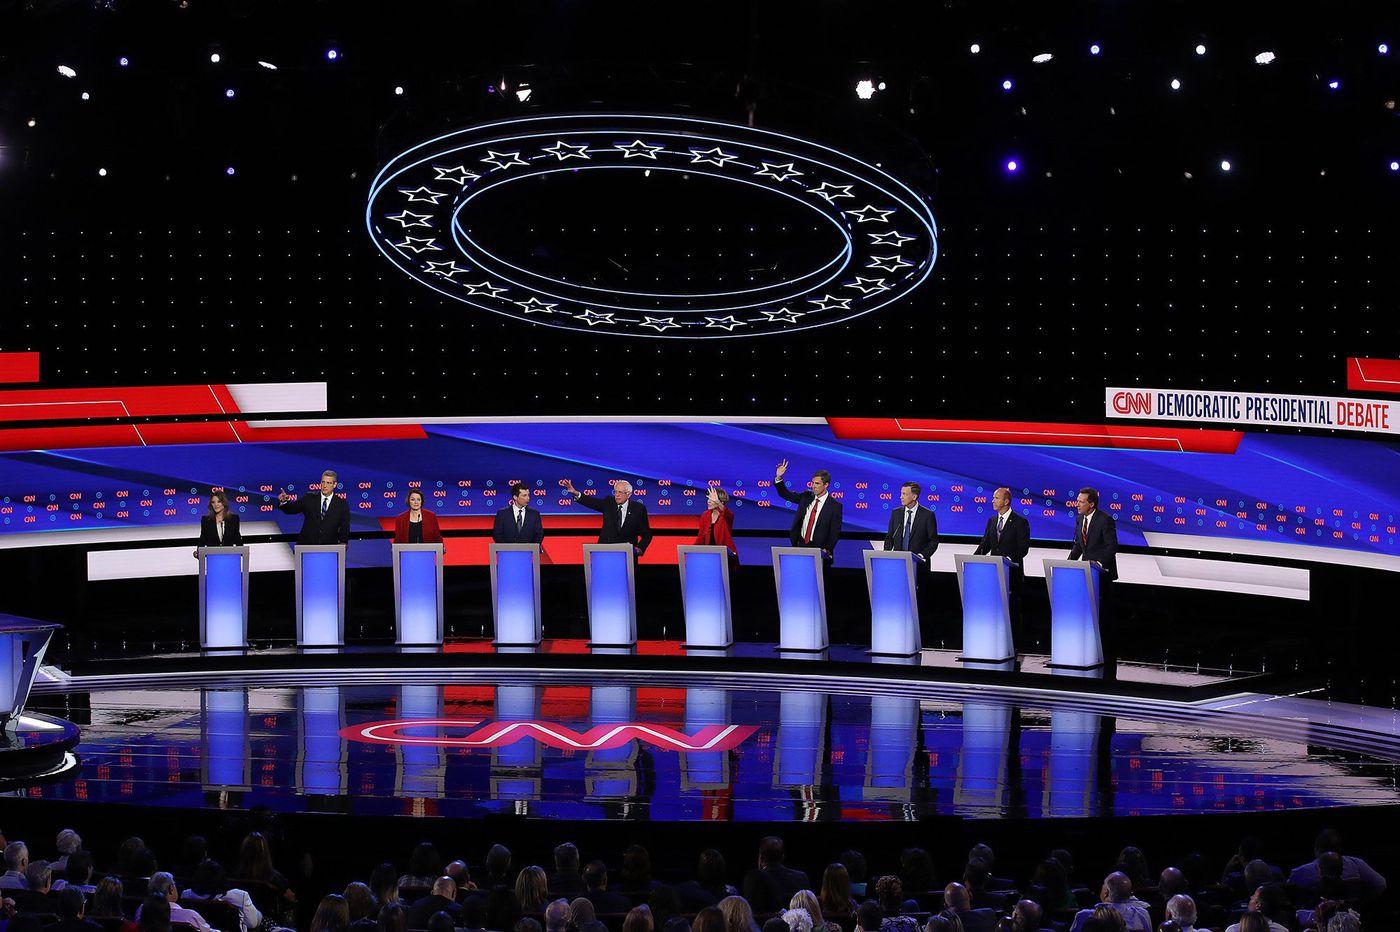 Democratic debate recap: Philly mass shooting noted in gun violence question, CNN trailer mocked